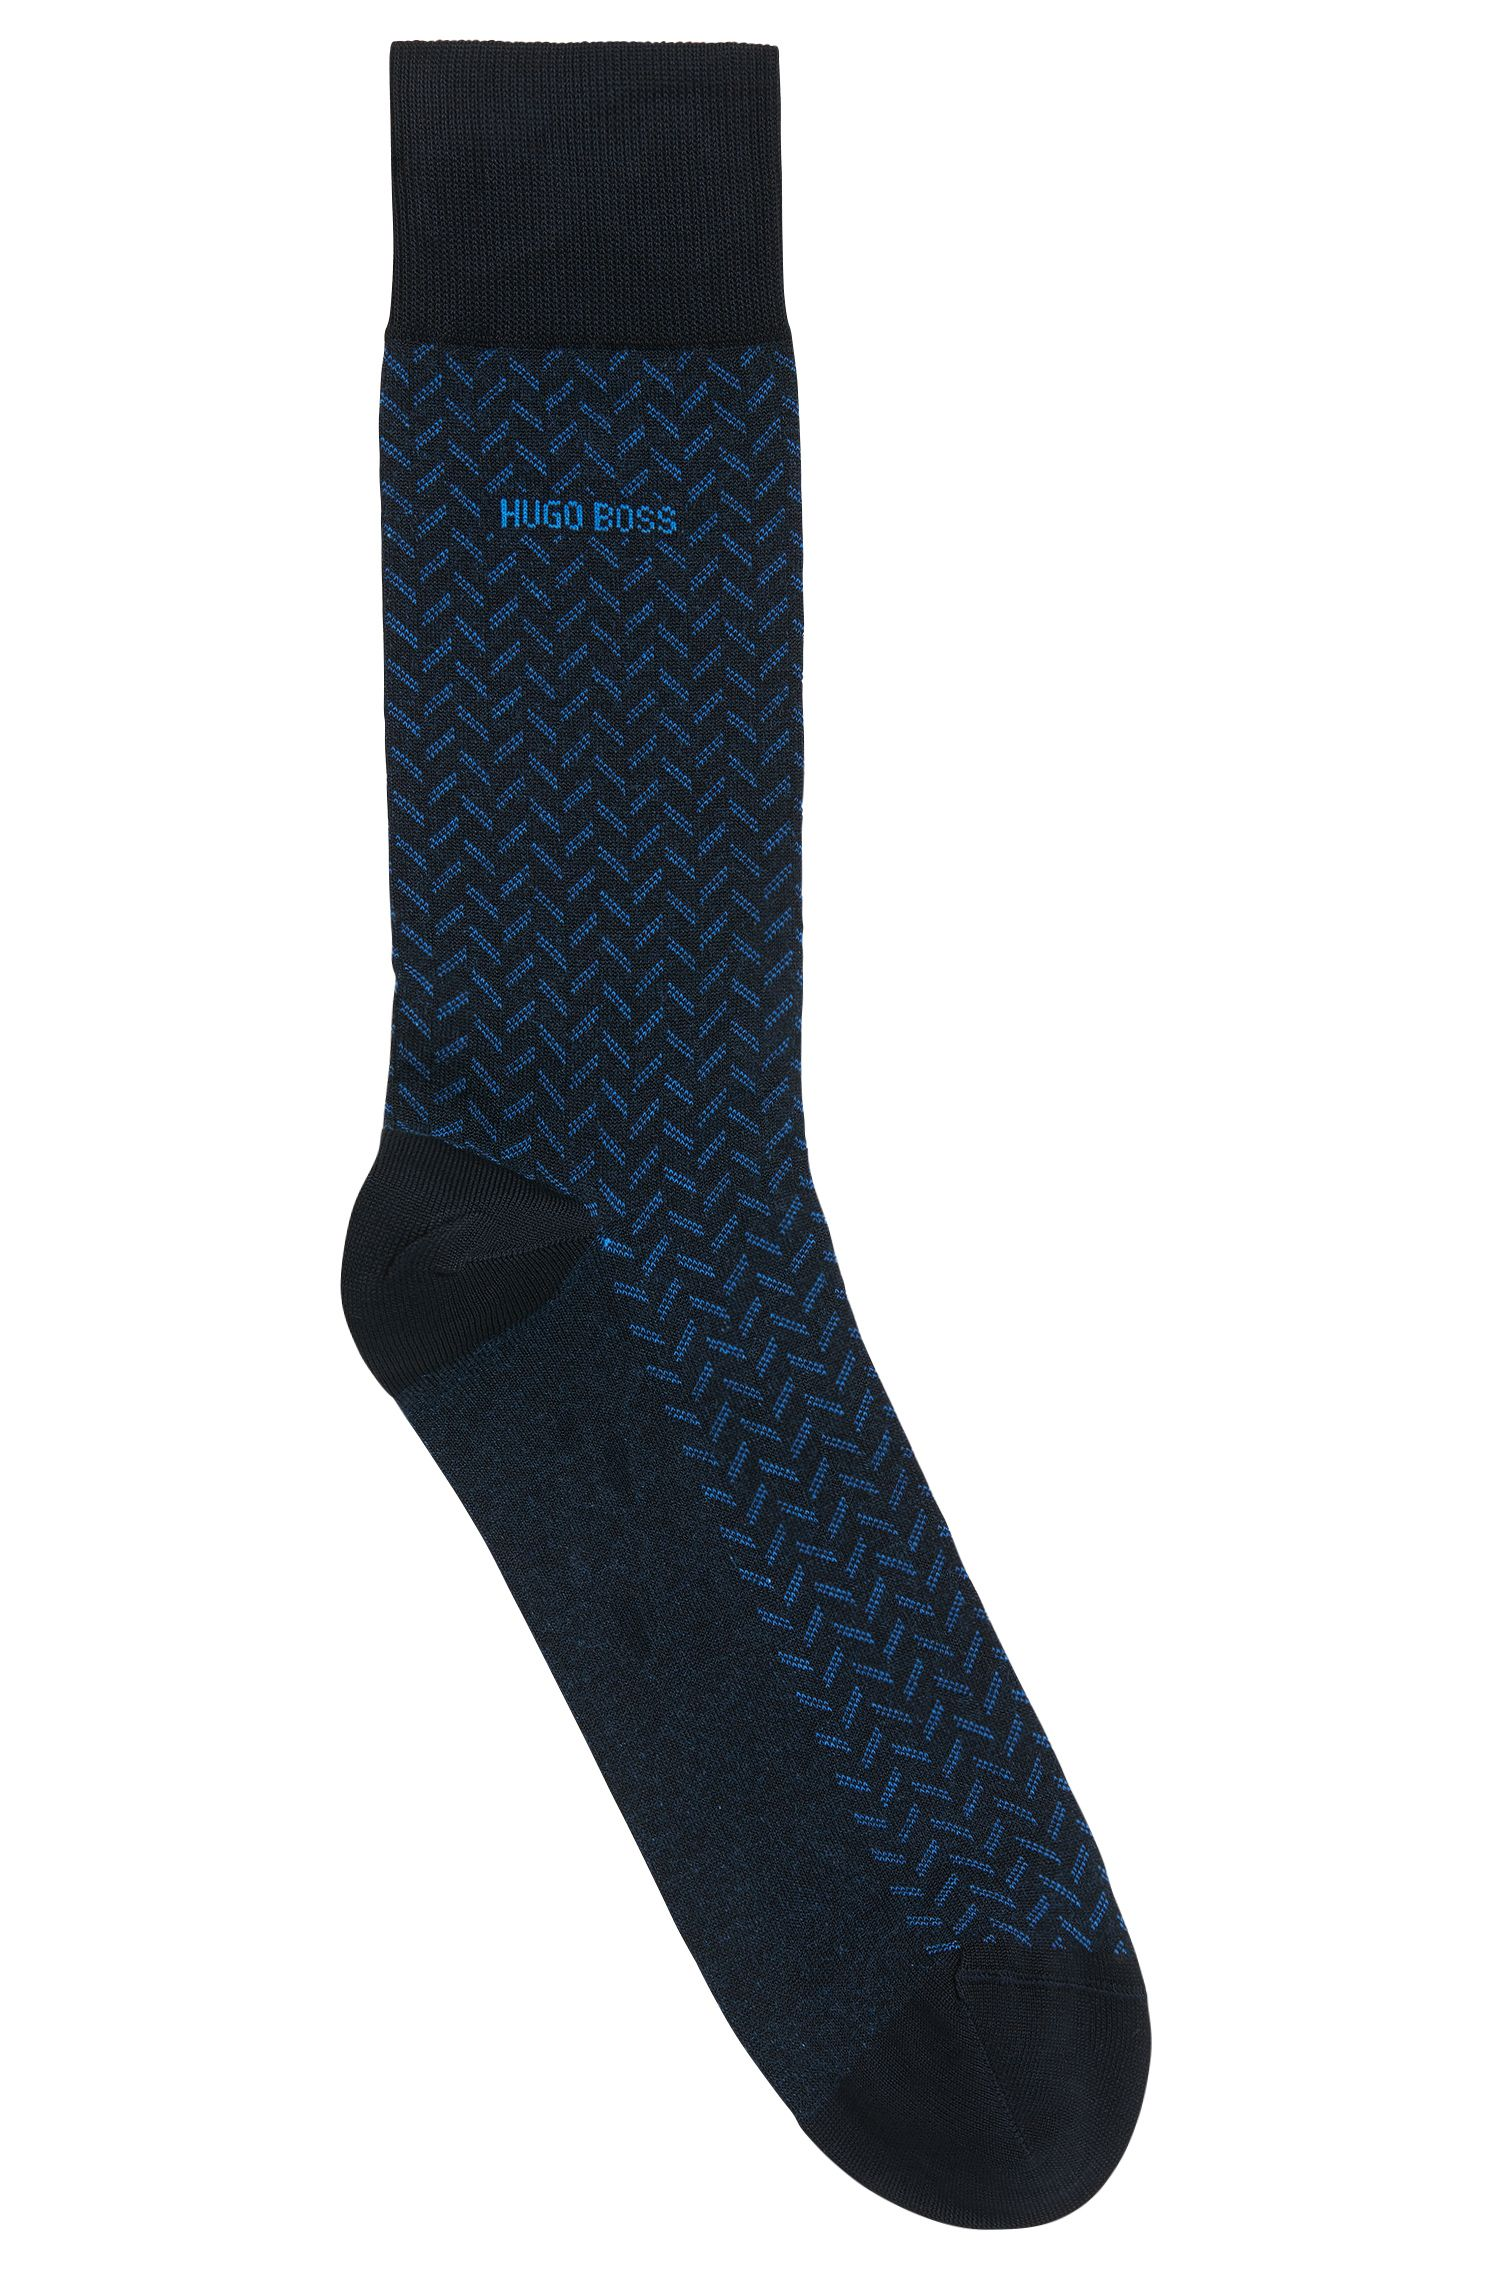 Chevron Striped Stretch Cotton Socks | RS MiniPattern US MC